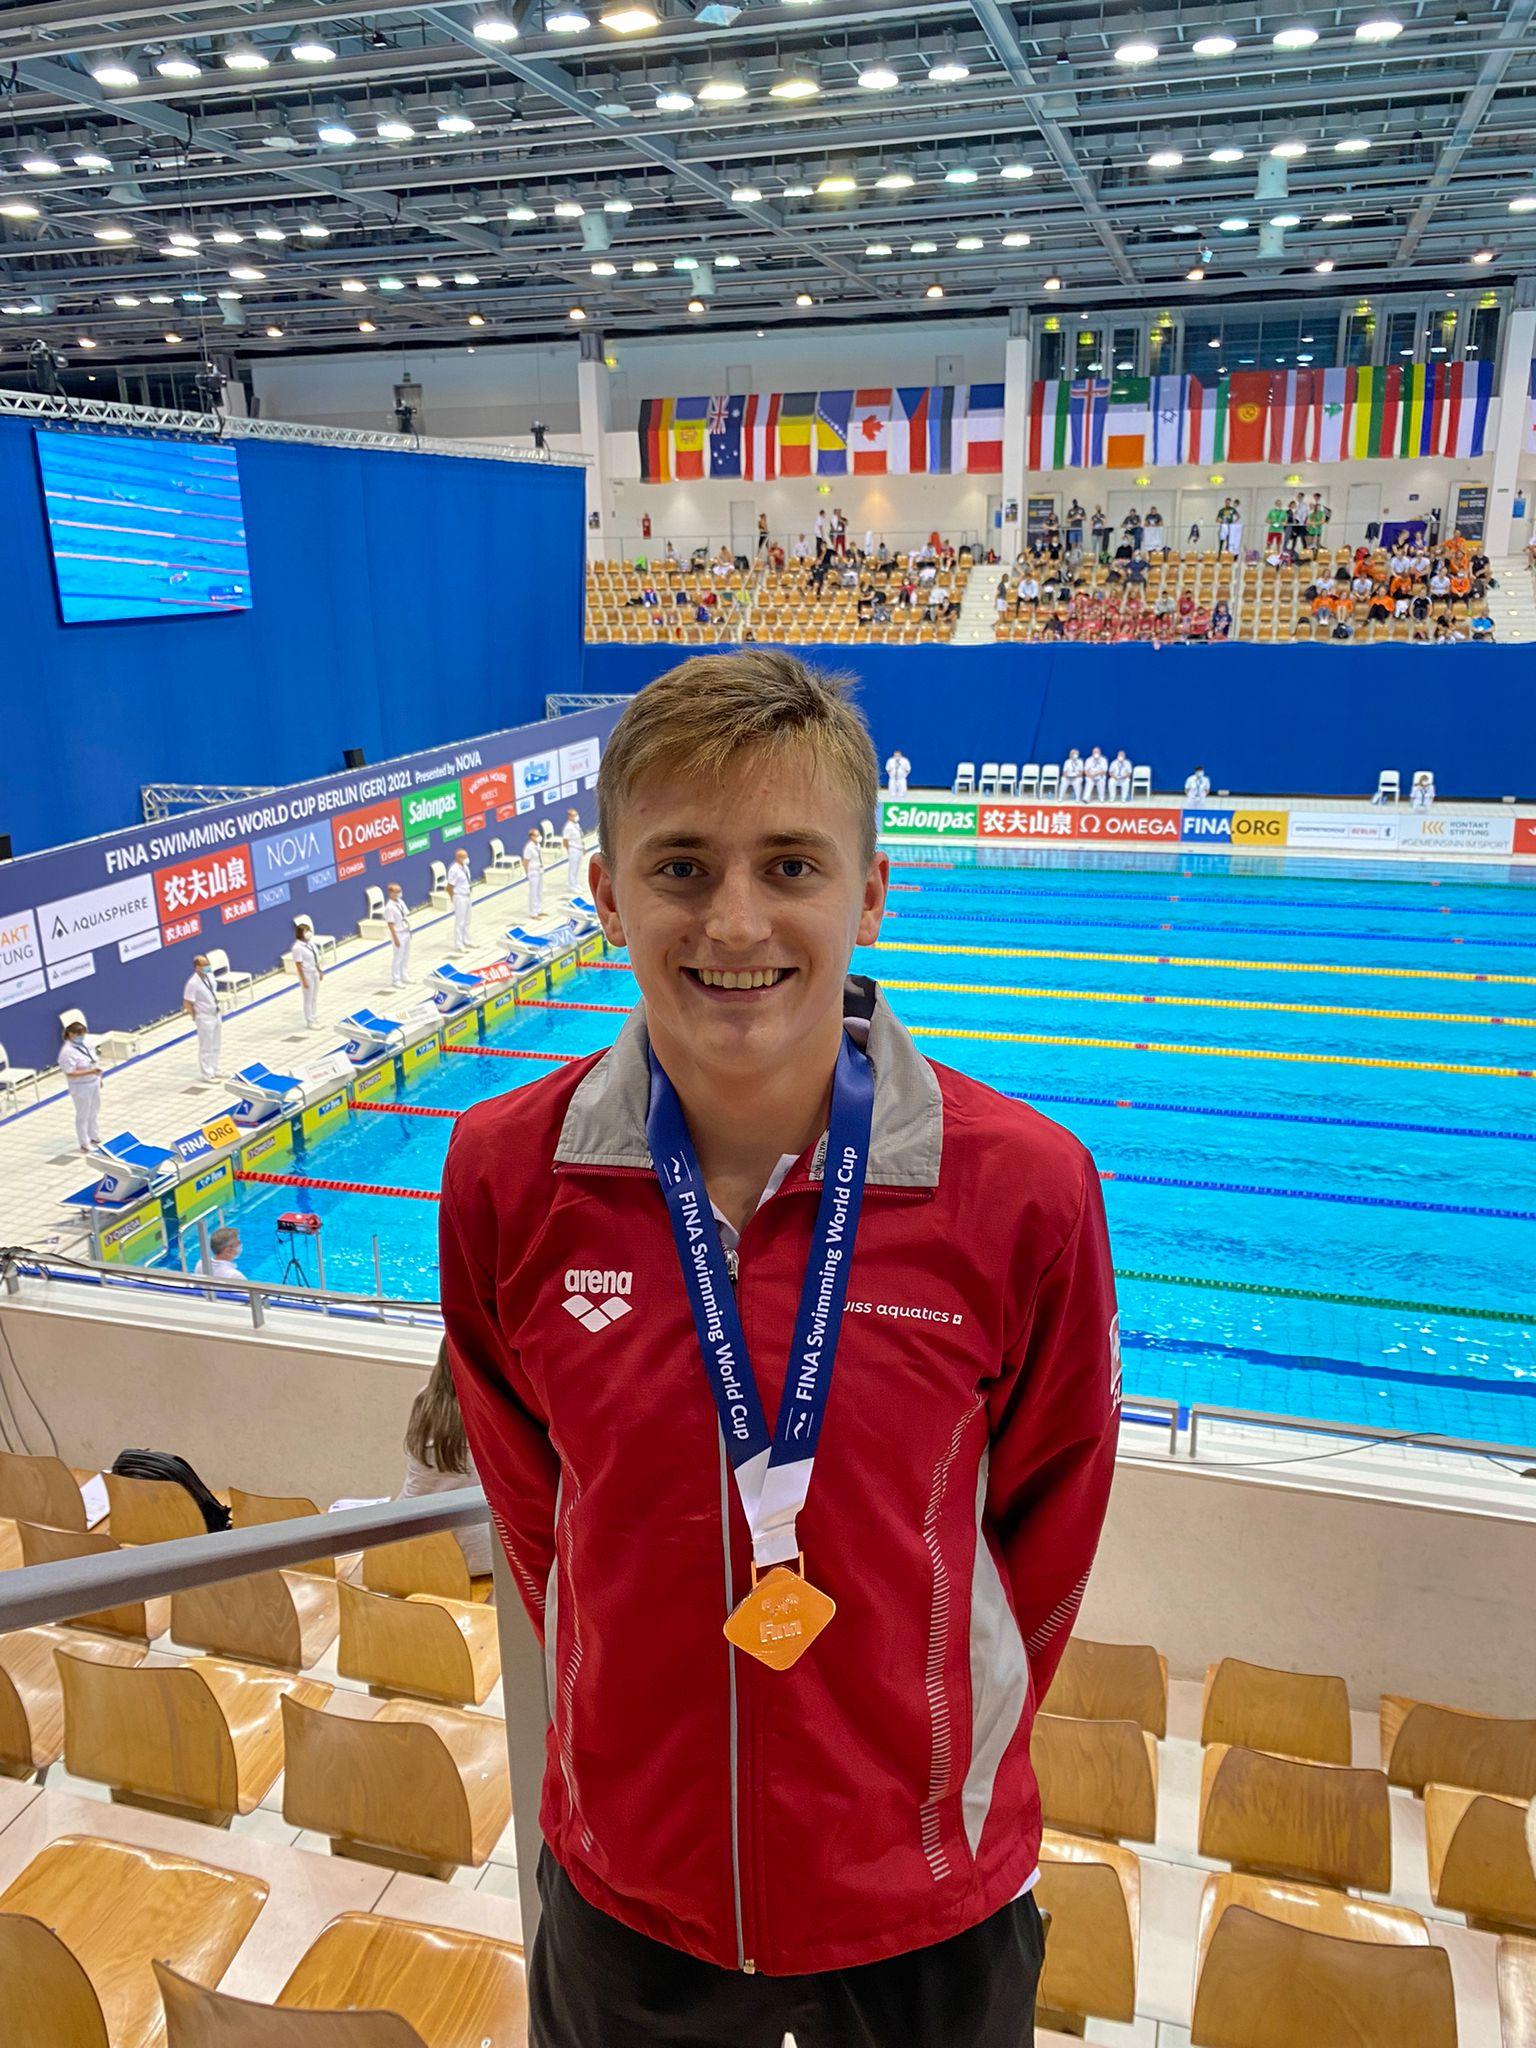 Schwimmen: FINA World Cup 2021 in Berlin 30. September bis 04. Oktober 2021